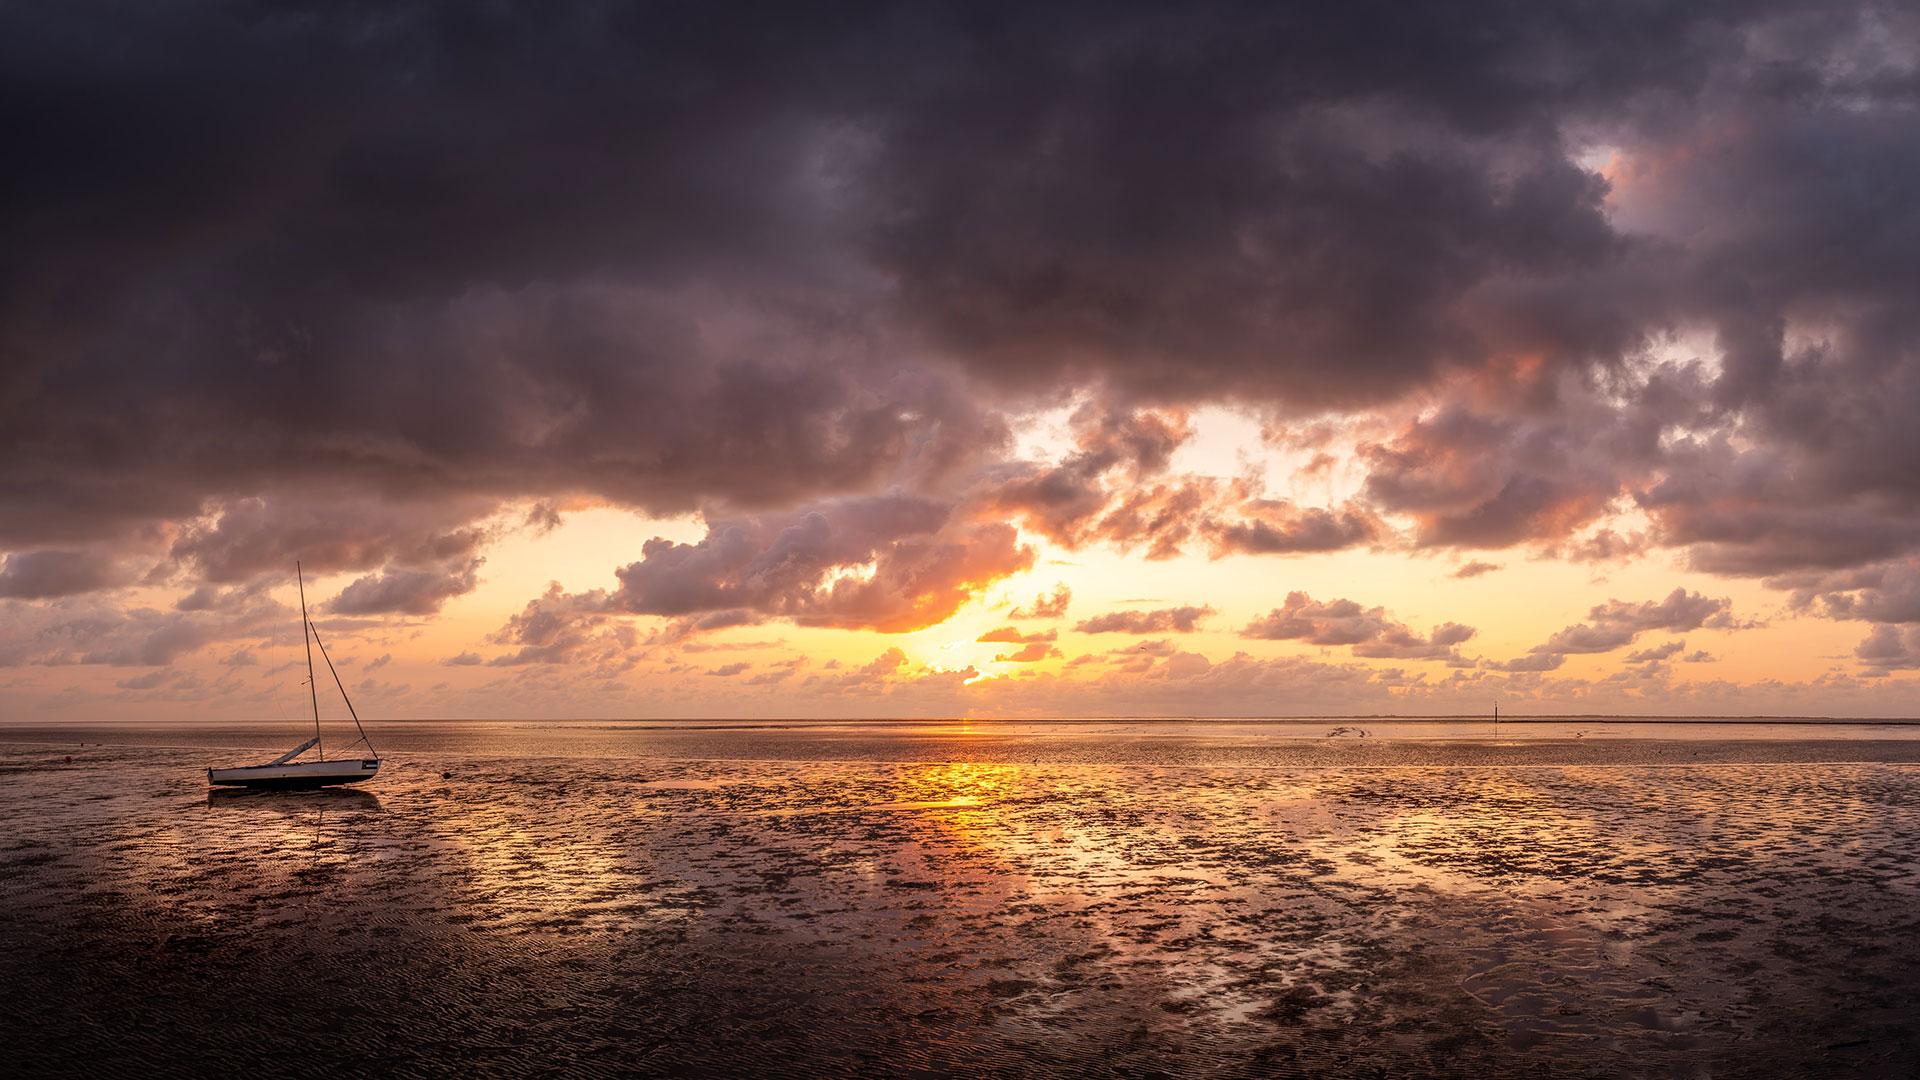 Lightyear One journeys to the UNESCO World Heritage Wadden Sea